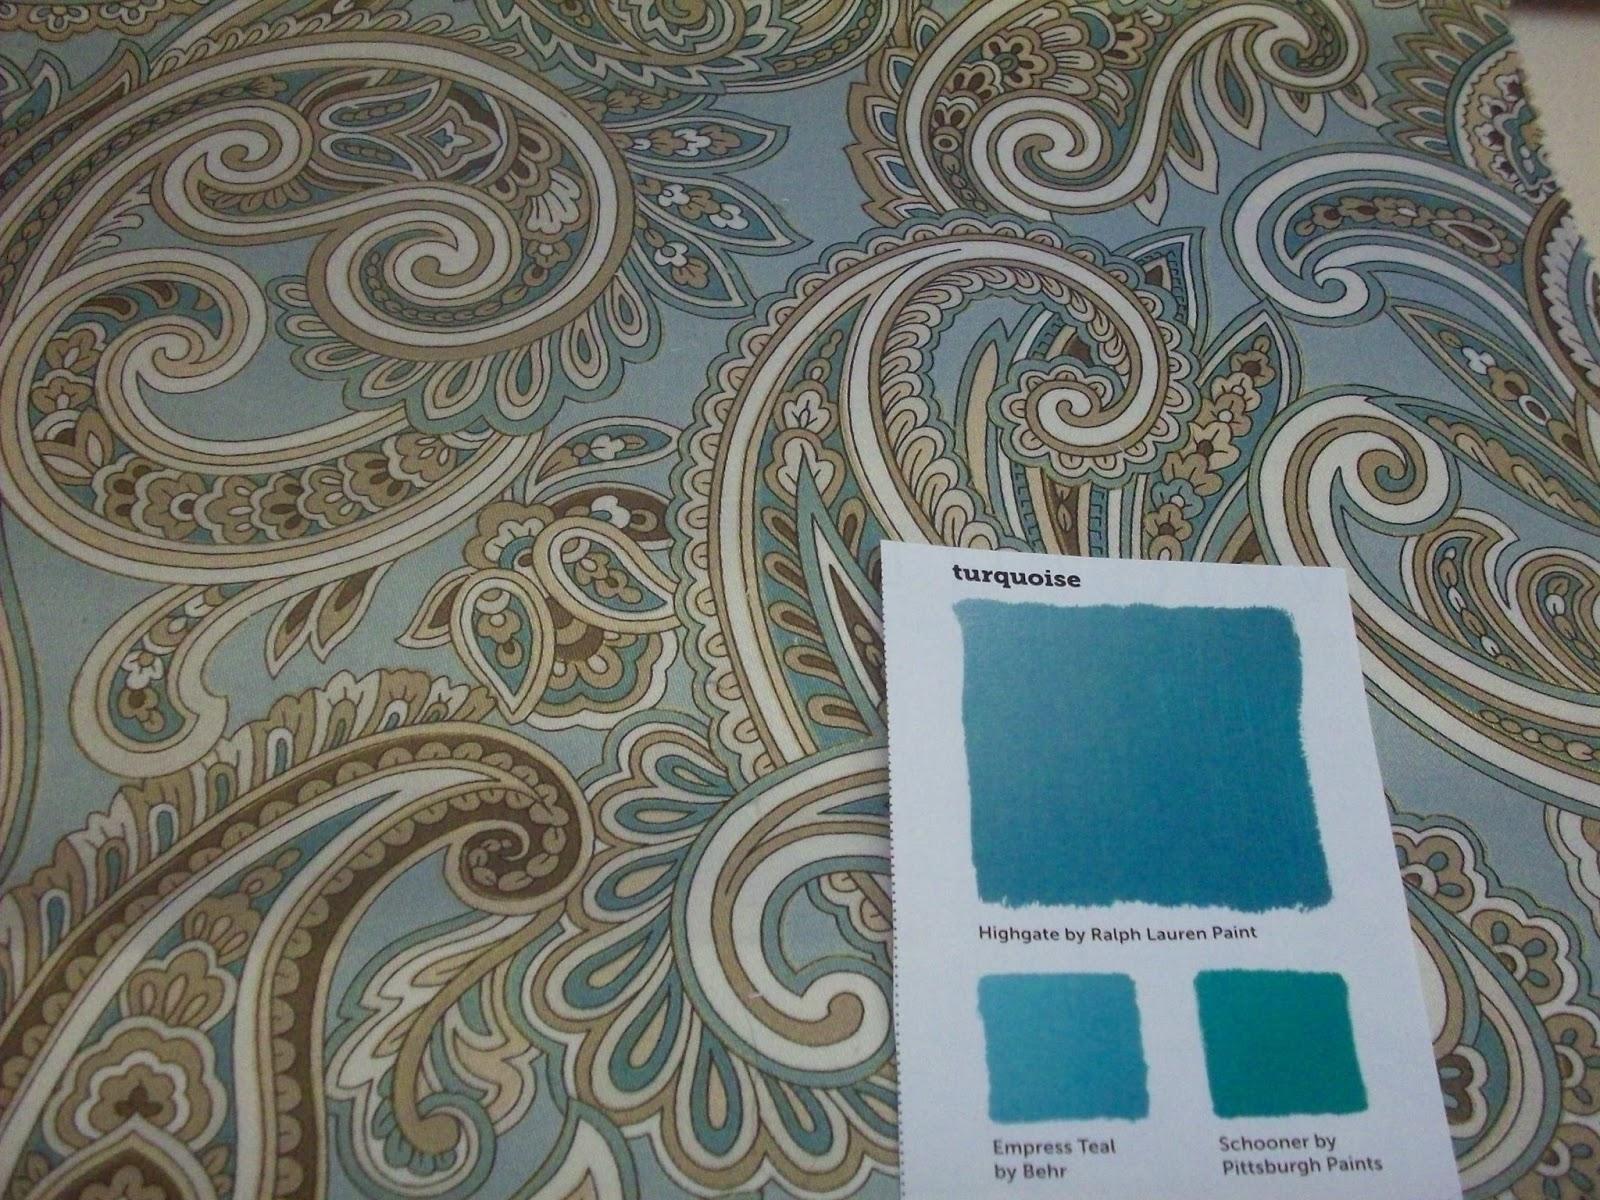 karen ann 39 s window treatments turquoise paints and fabrics. Black Bedroom Furniture Sets. Home Design Ideas